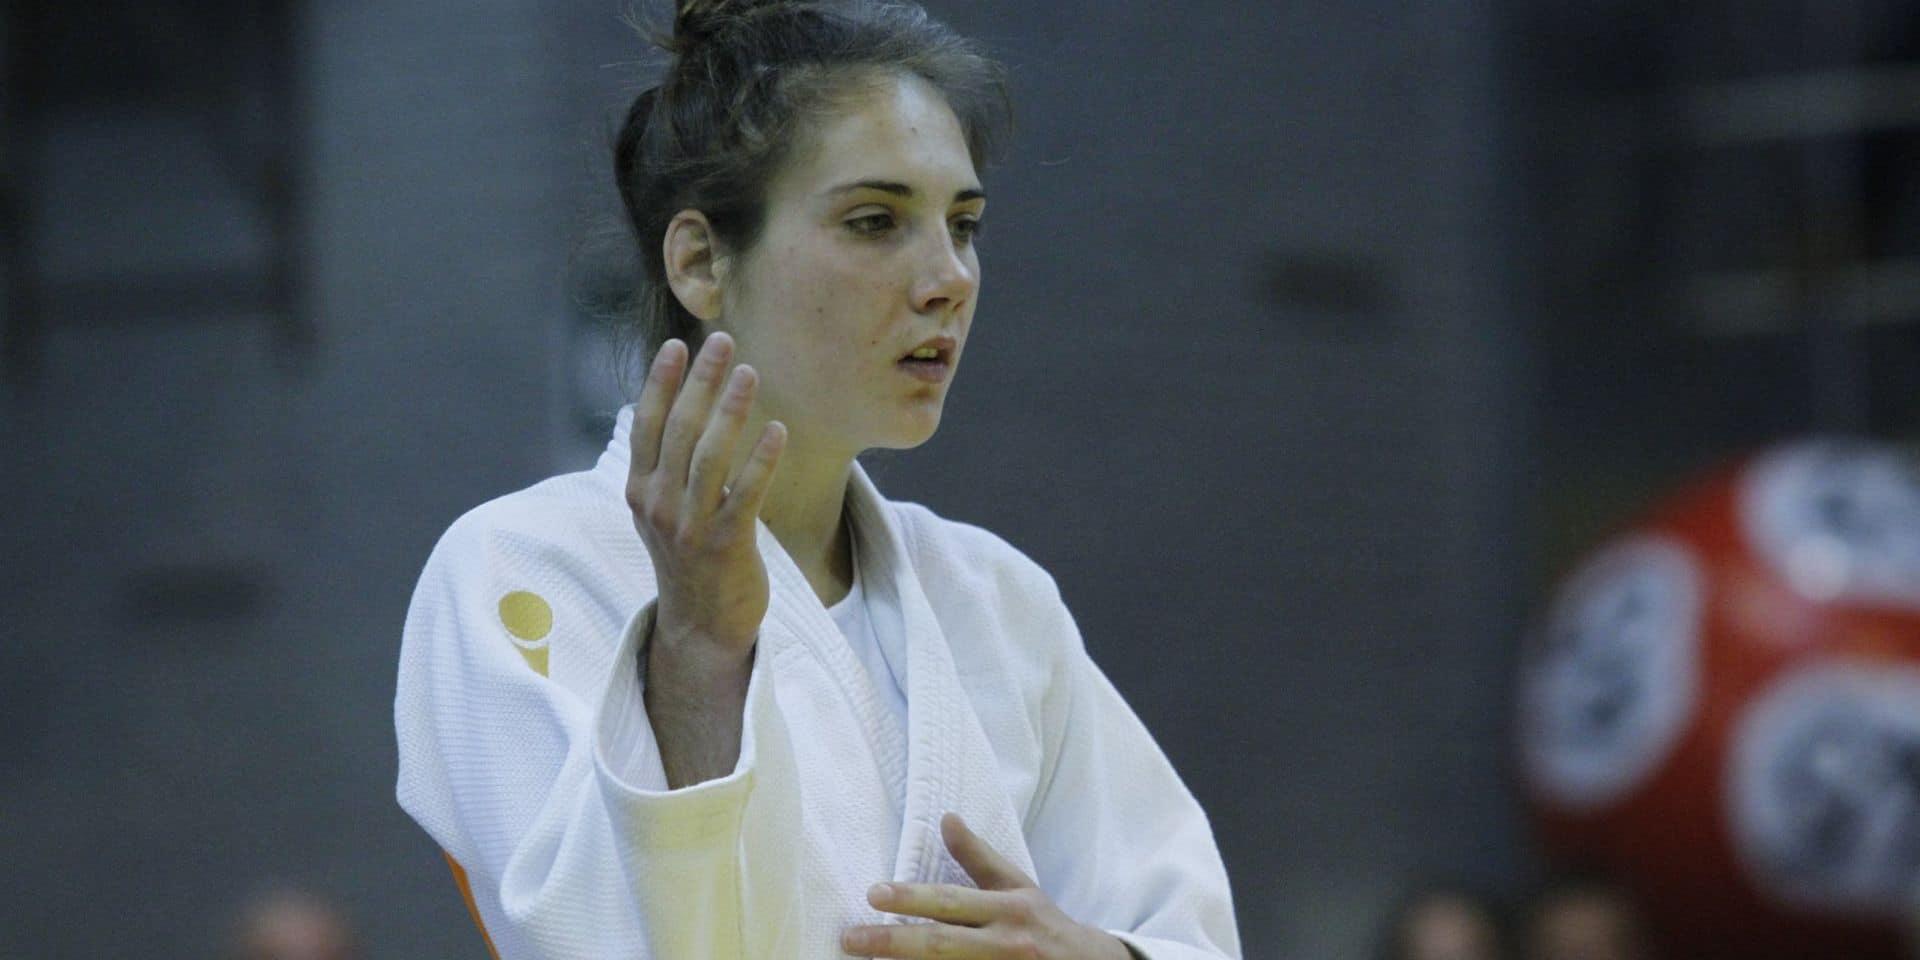 Judo : La superbe journée d'Amber Ryheul à Budapest